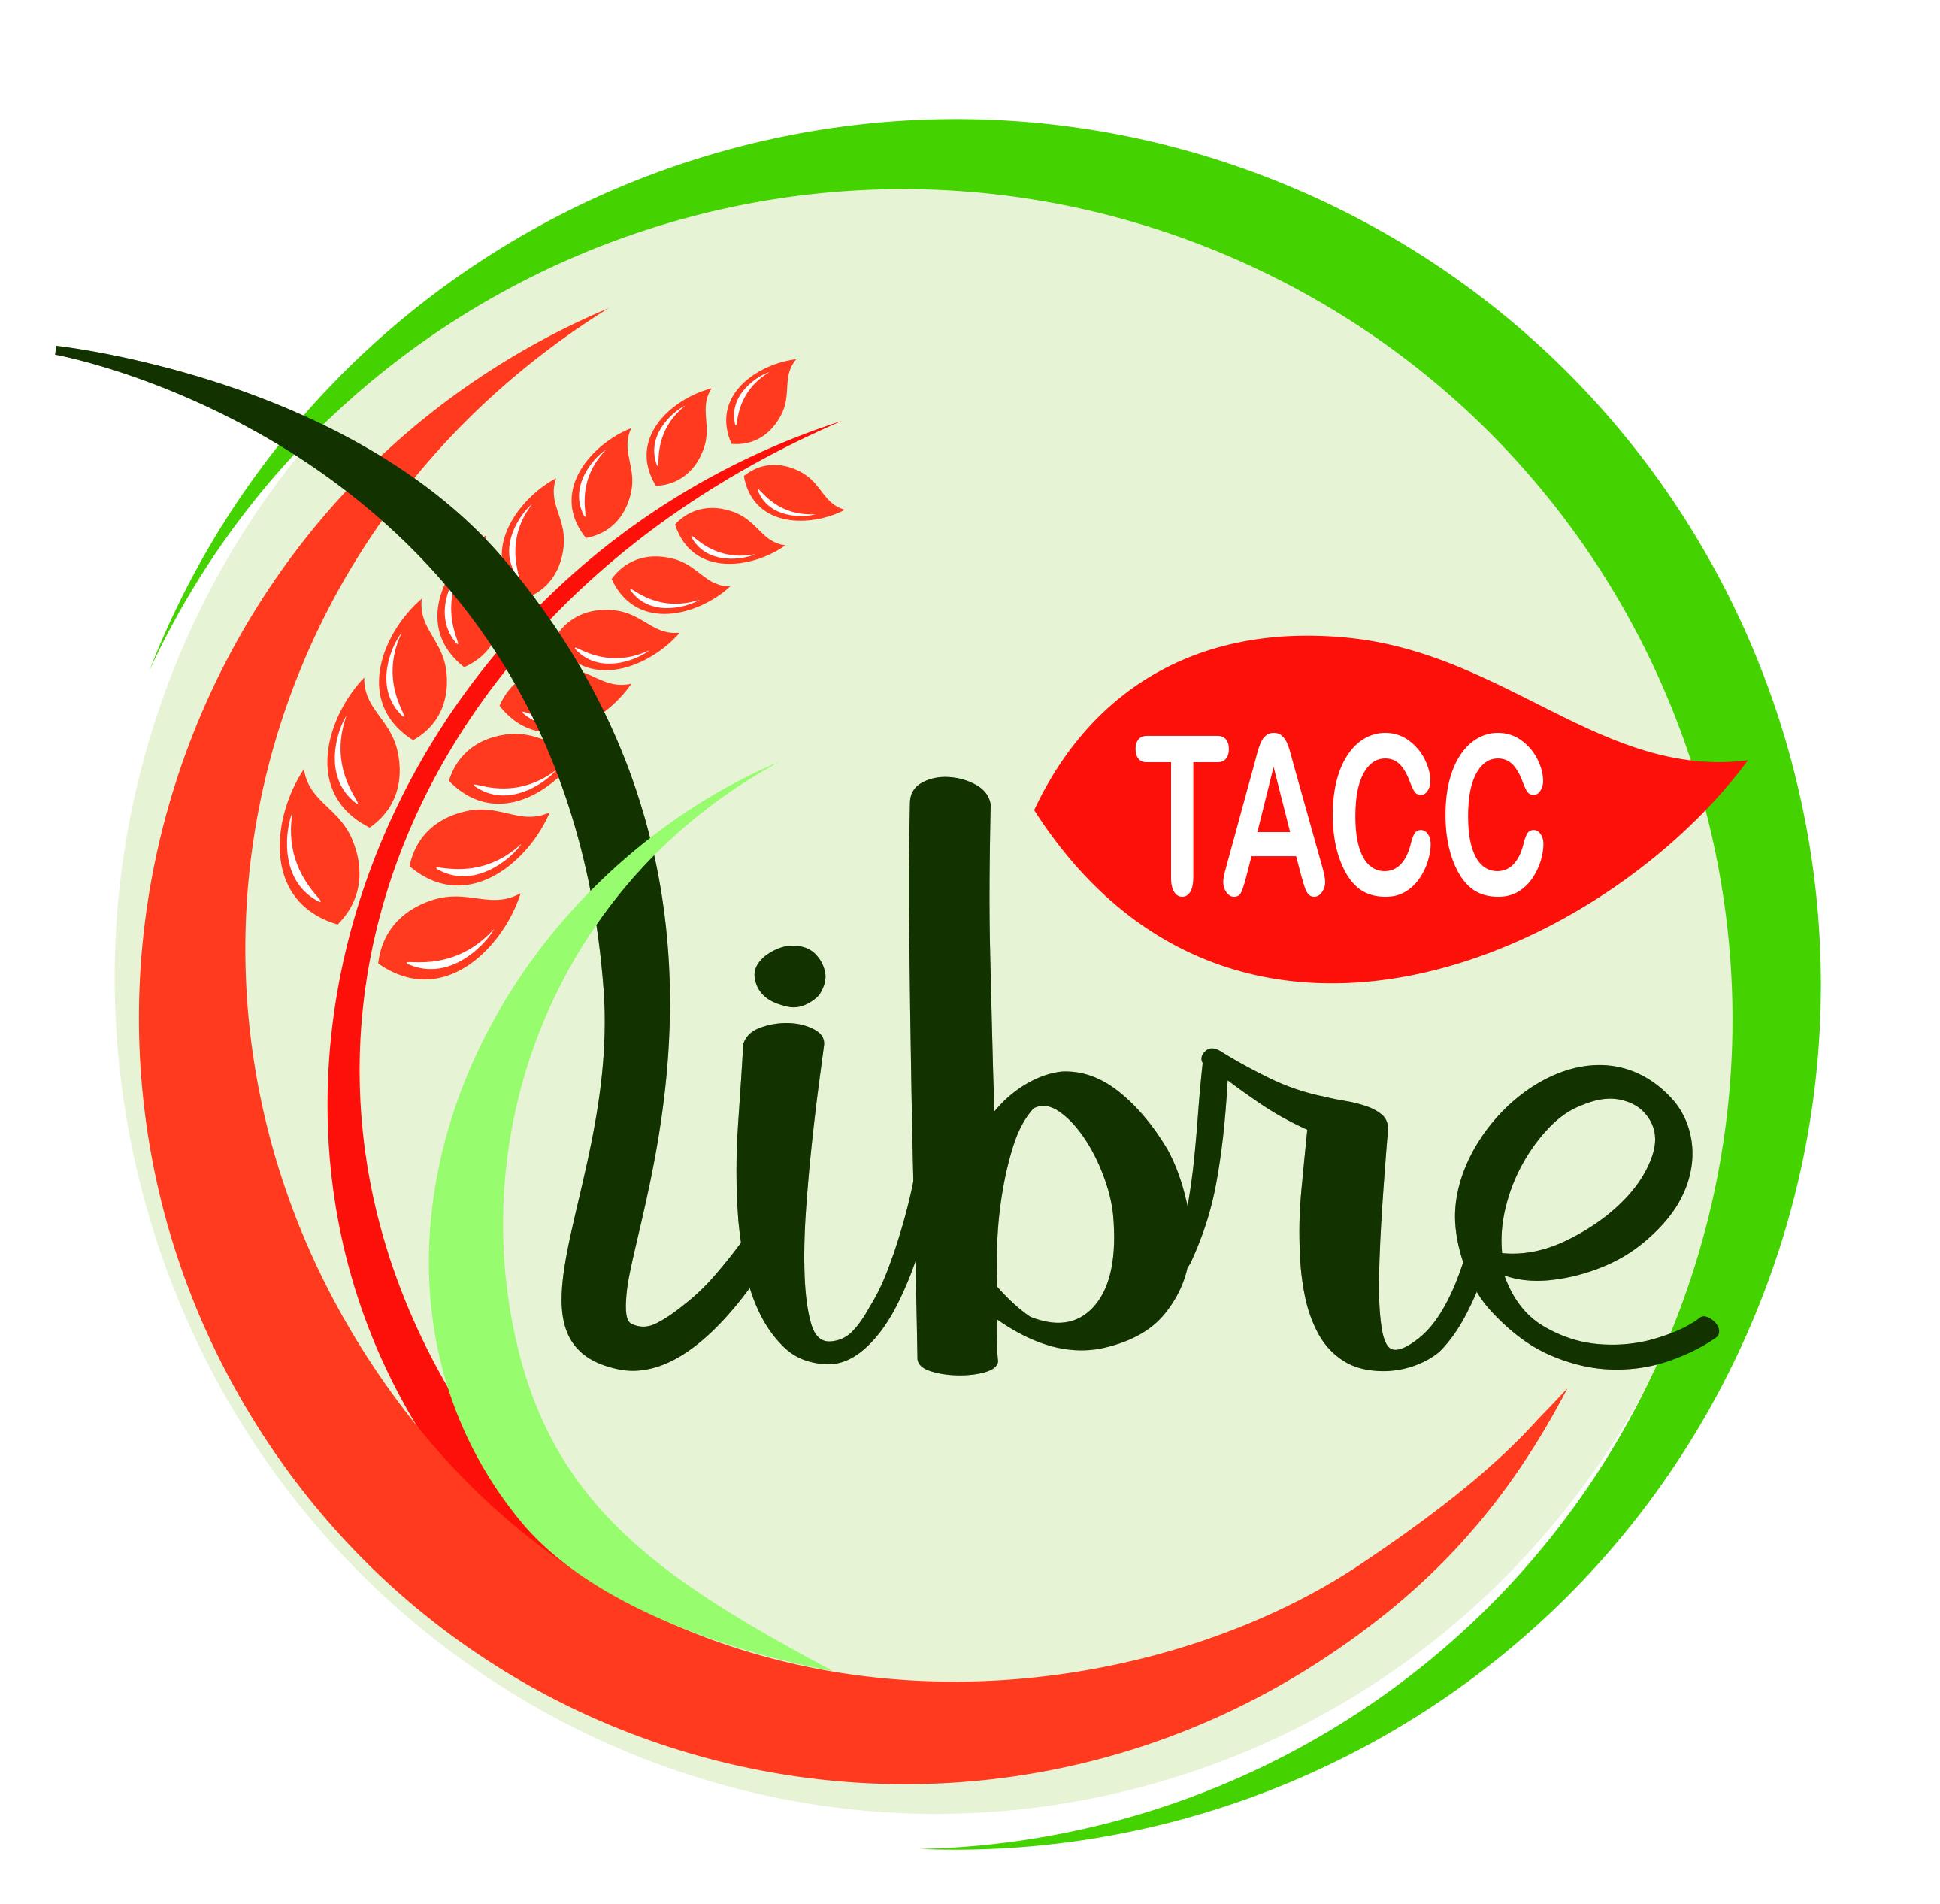 Libretacc